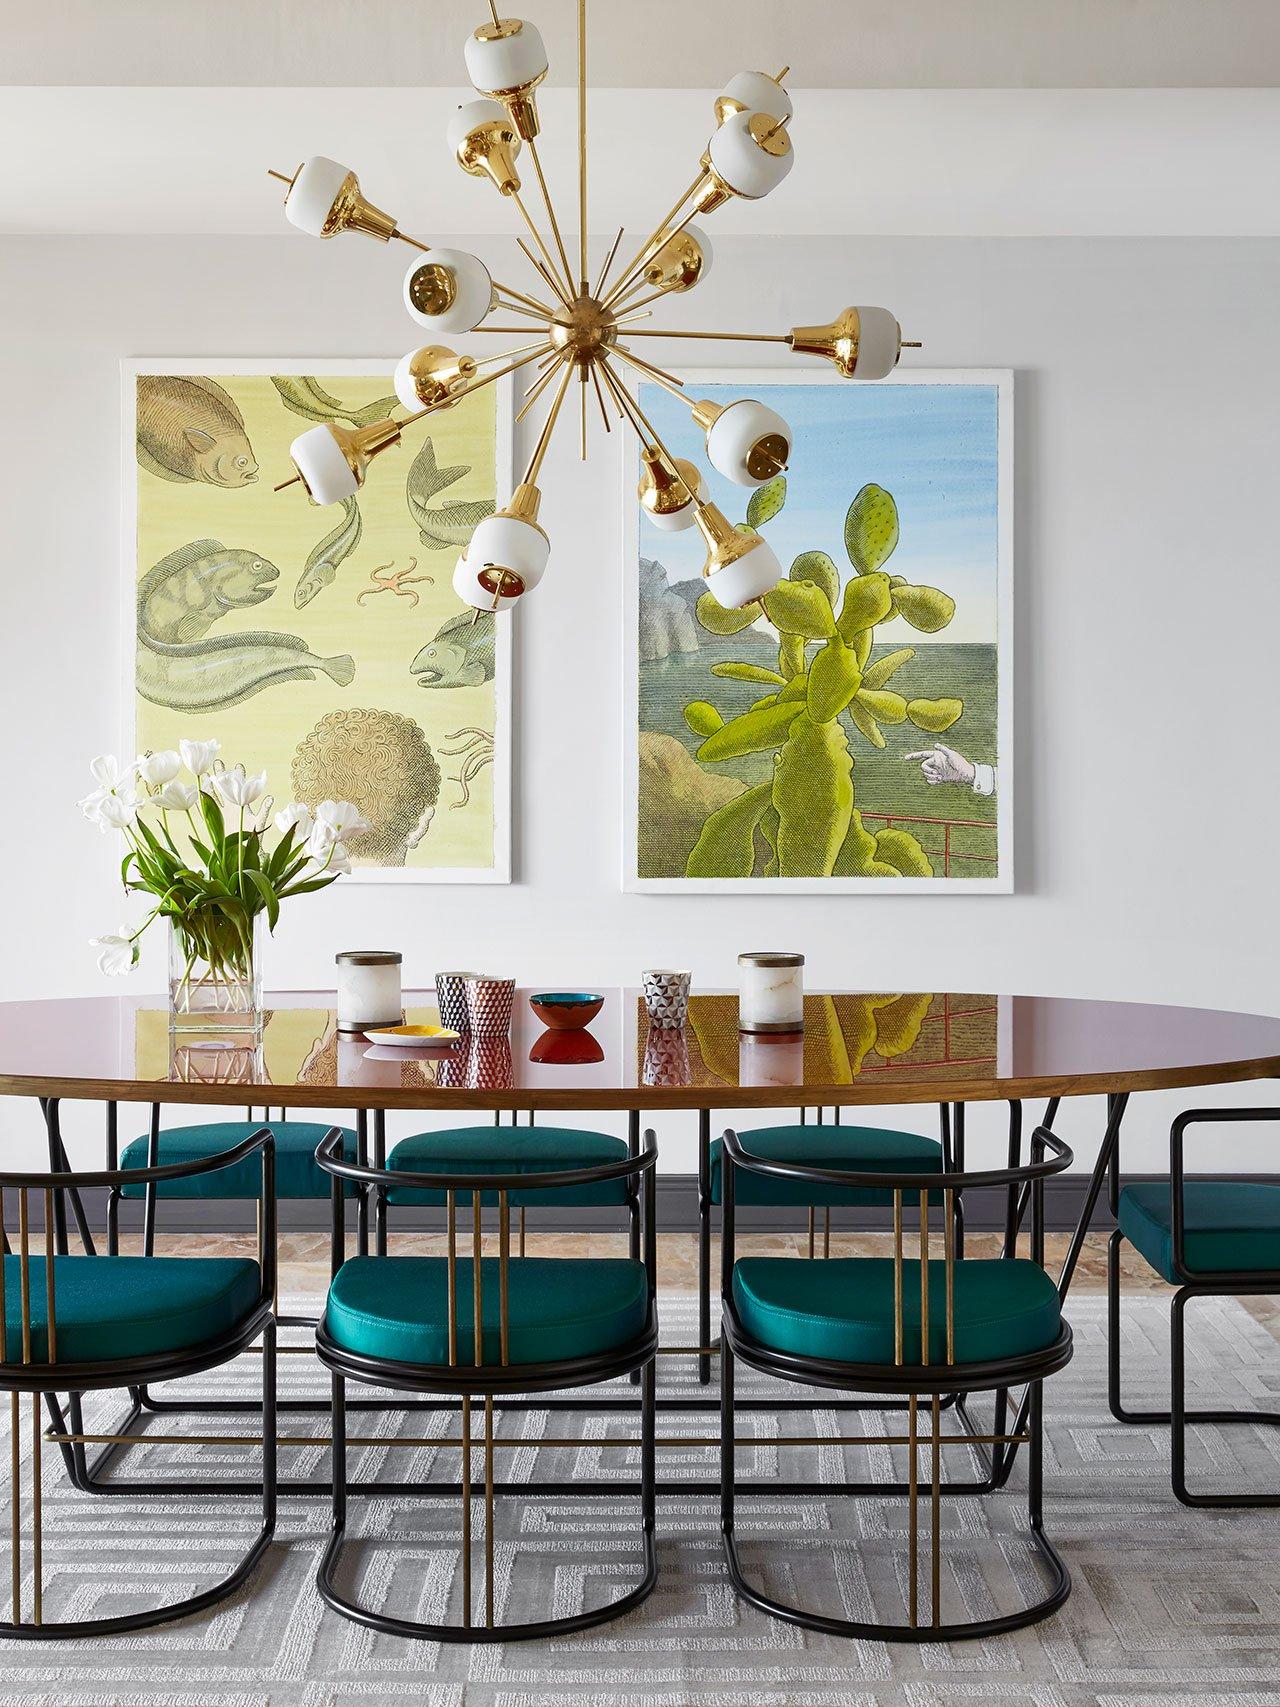 Sputnik Chandelier Lights Up Mid Century Dining Room in Monaco